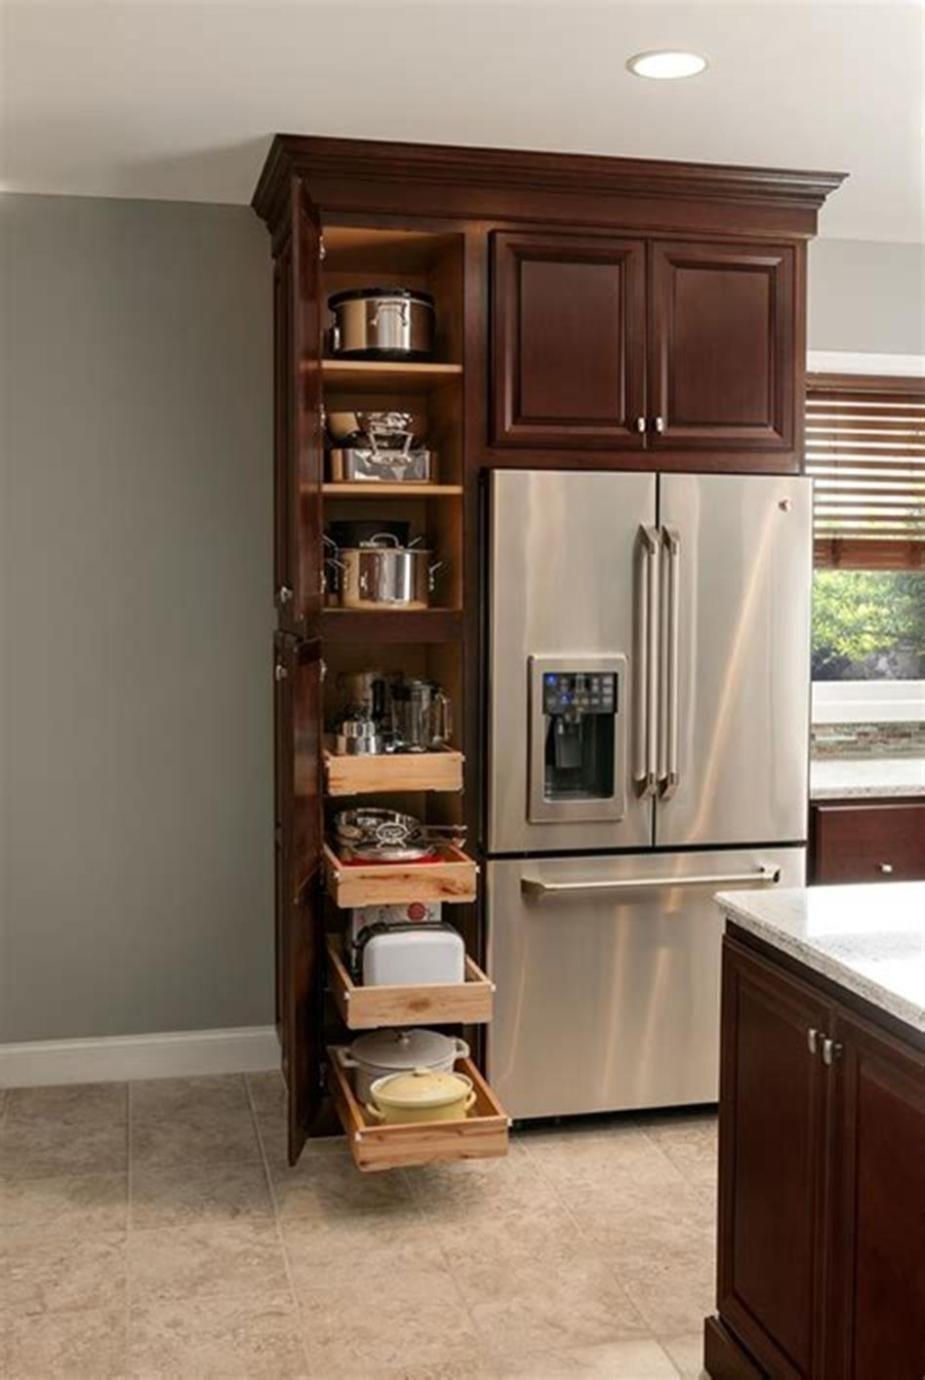 35 amazing kitchen cabinet organization ideas to inspire